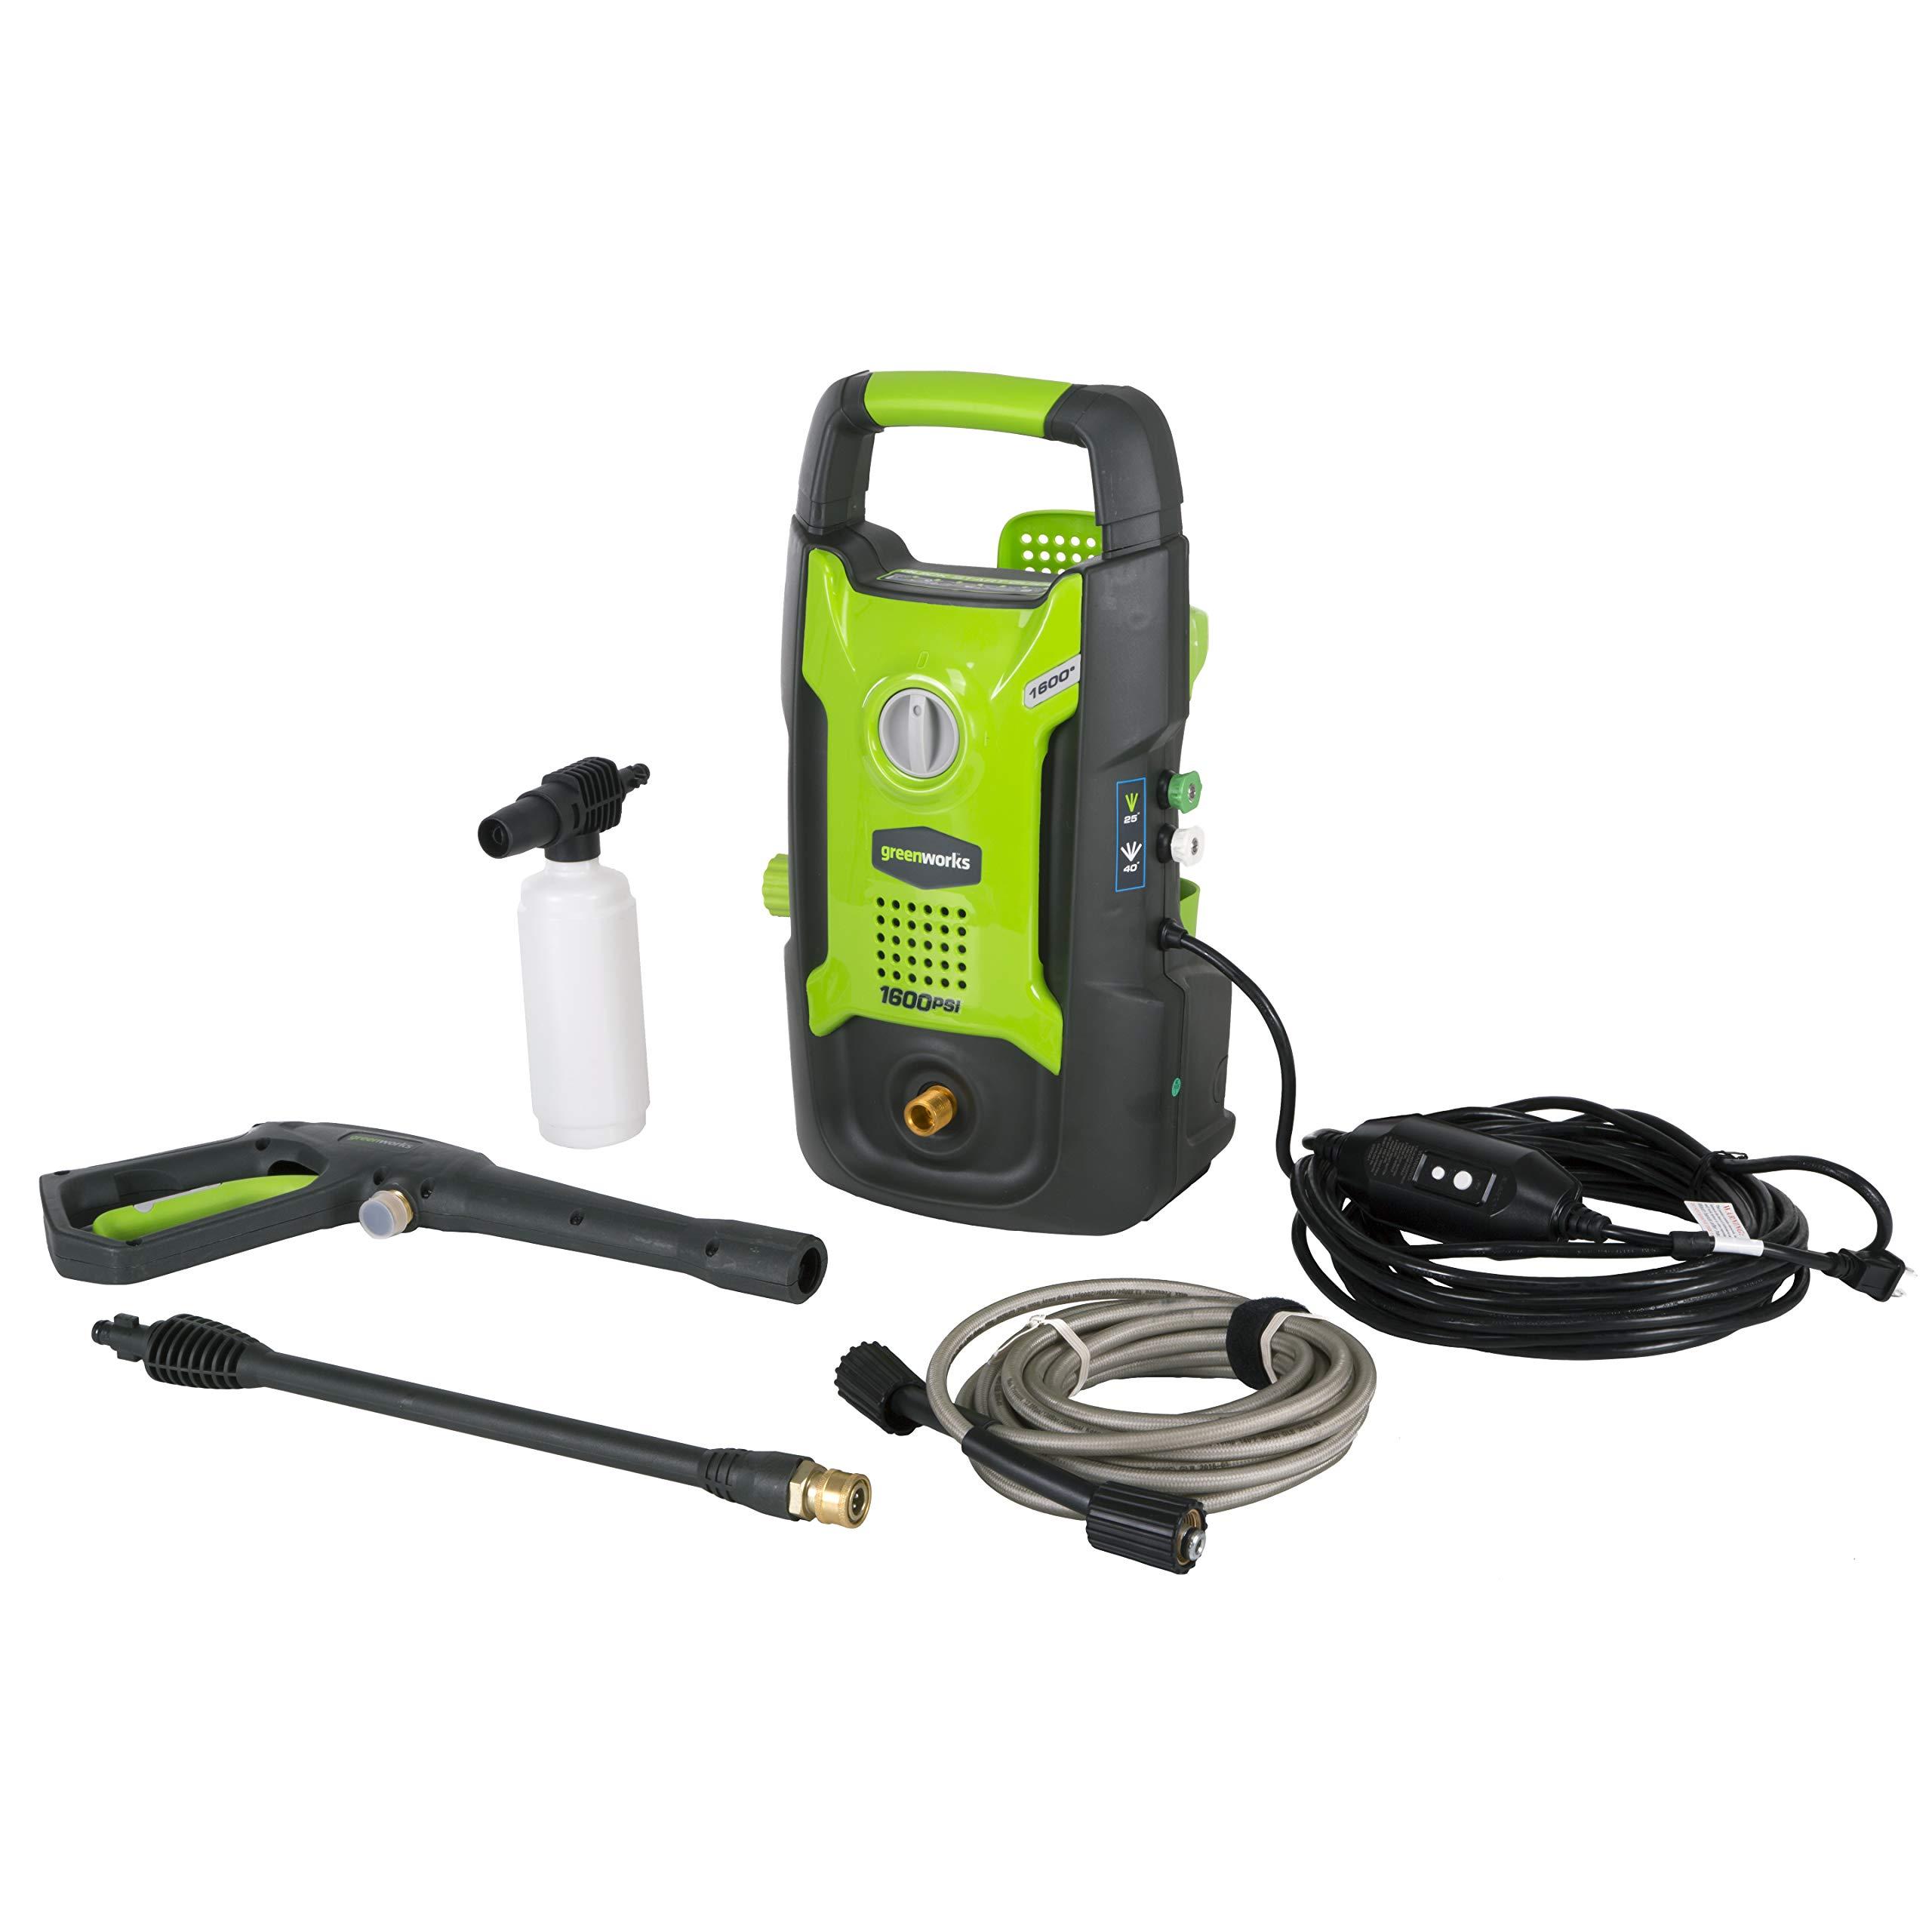 Greenworks 1600 PSI 13 Amp 1.2 GPM Pressure Washer GPW1602 by Greenworks